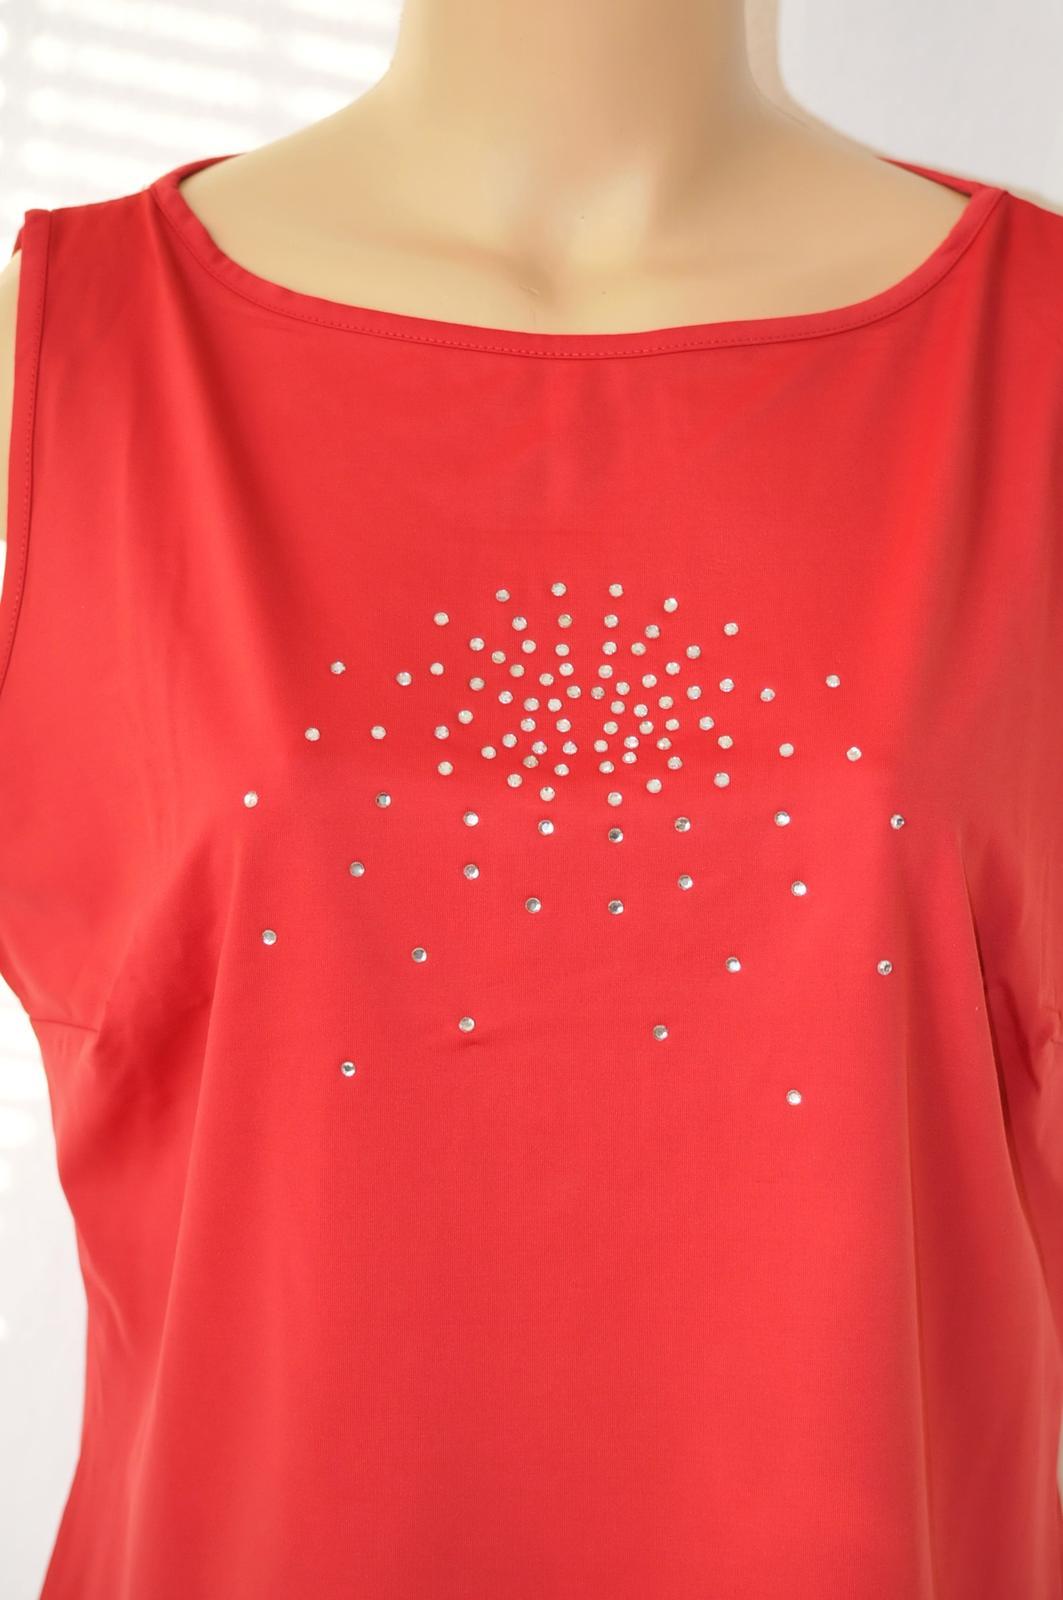 Dámske tričko - Obrázok č. 2